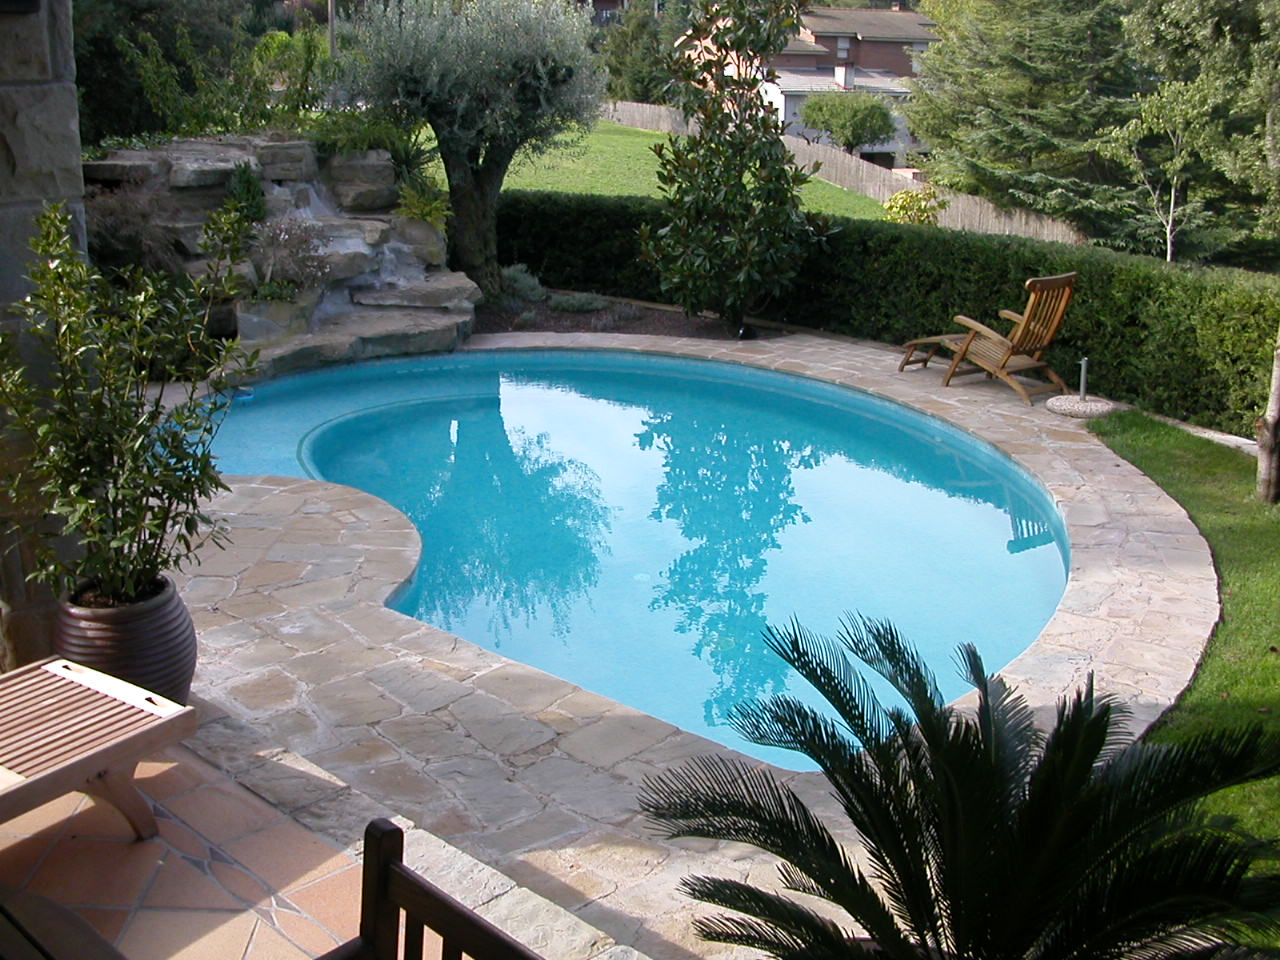 imagen+piscina.jpg